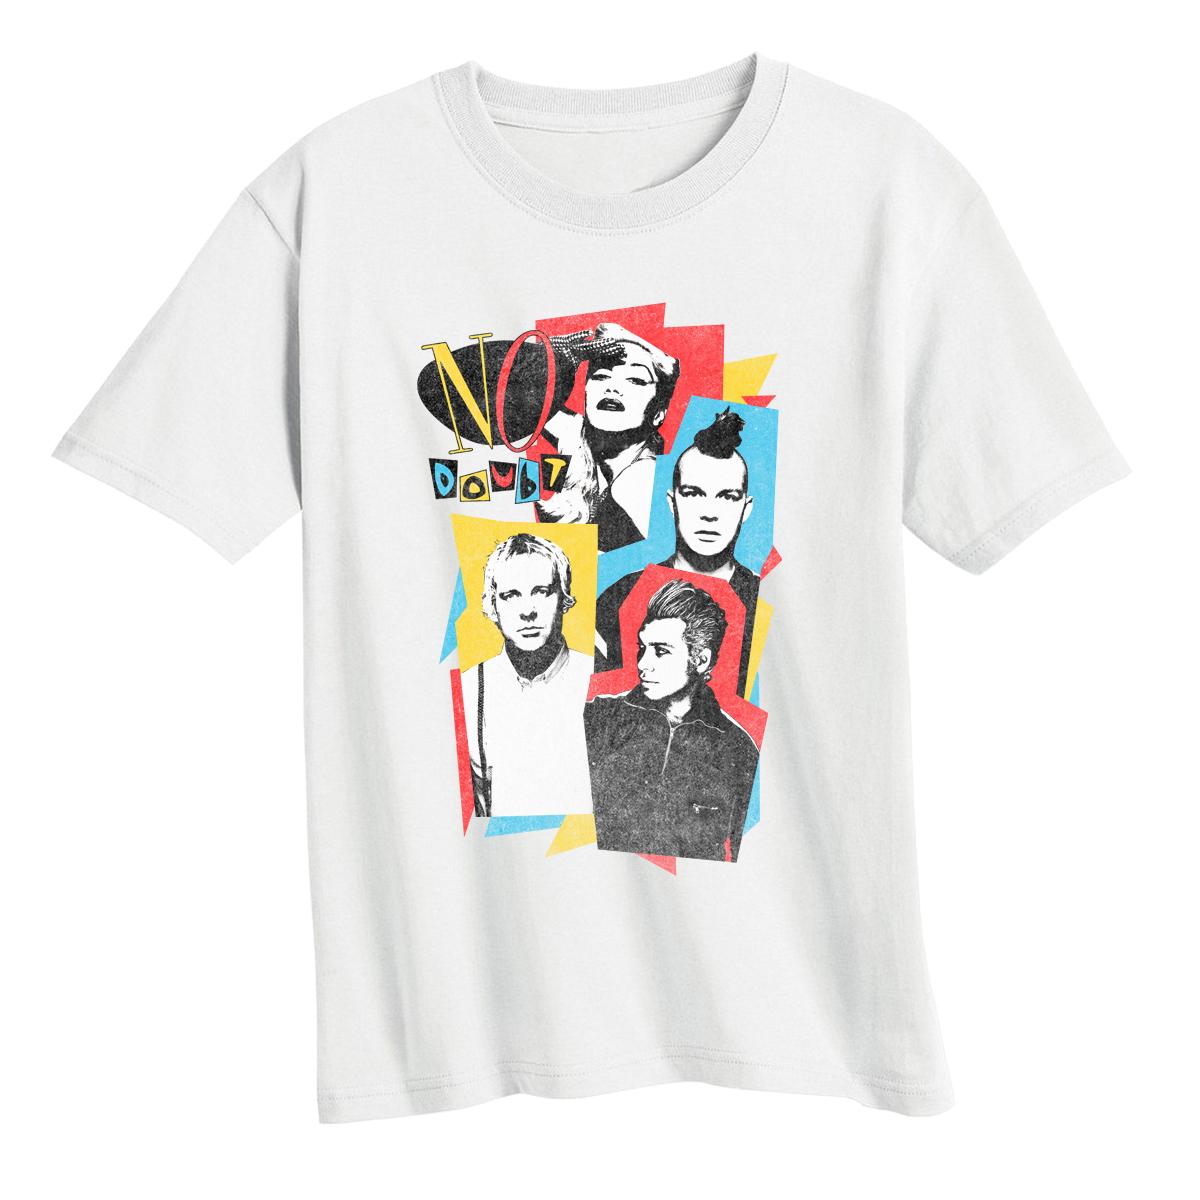 Abstract Band Photo Youth T-Shirt